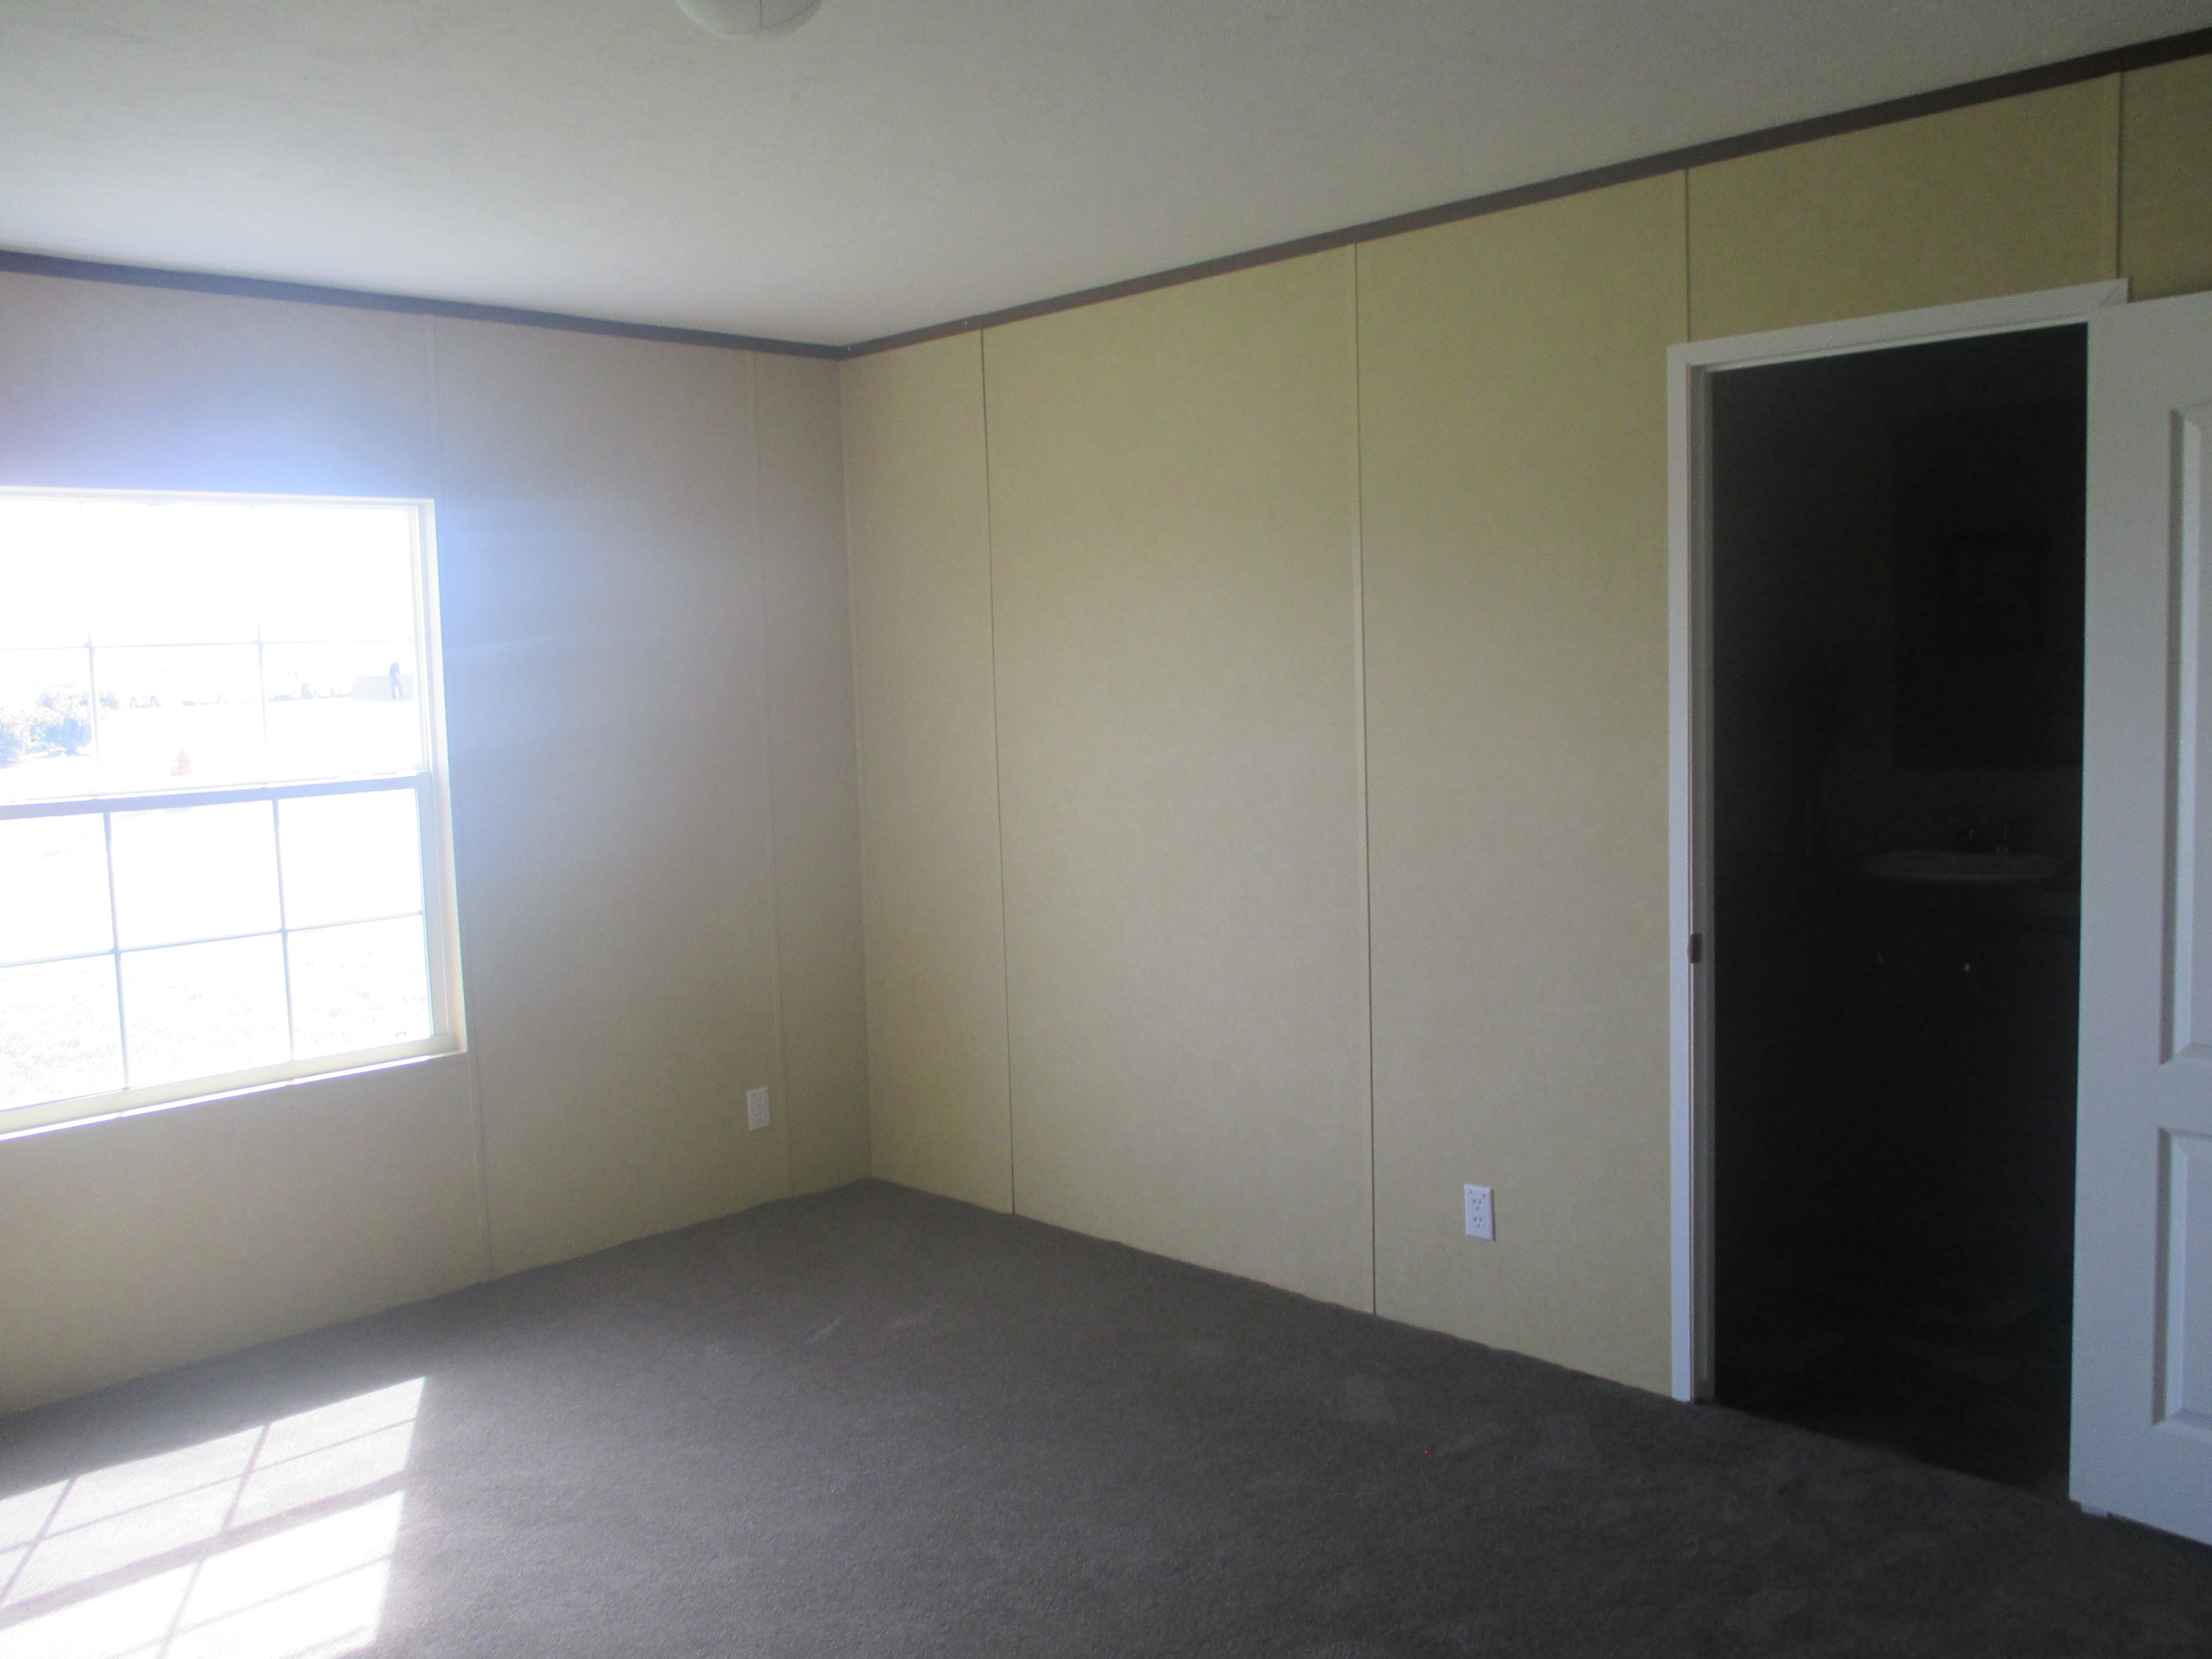 Master bedroom Clayton homes, Home, Master bedroom